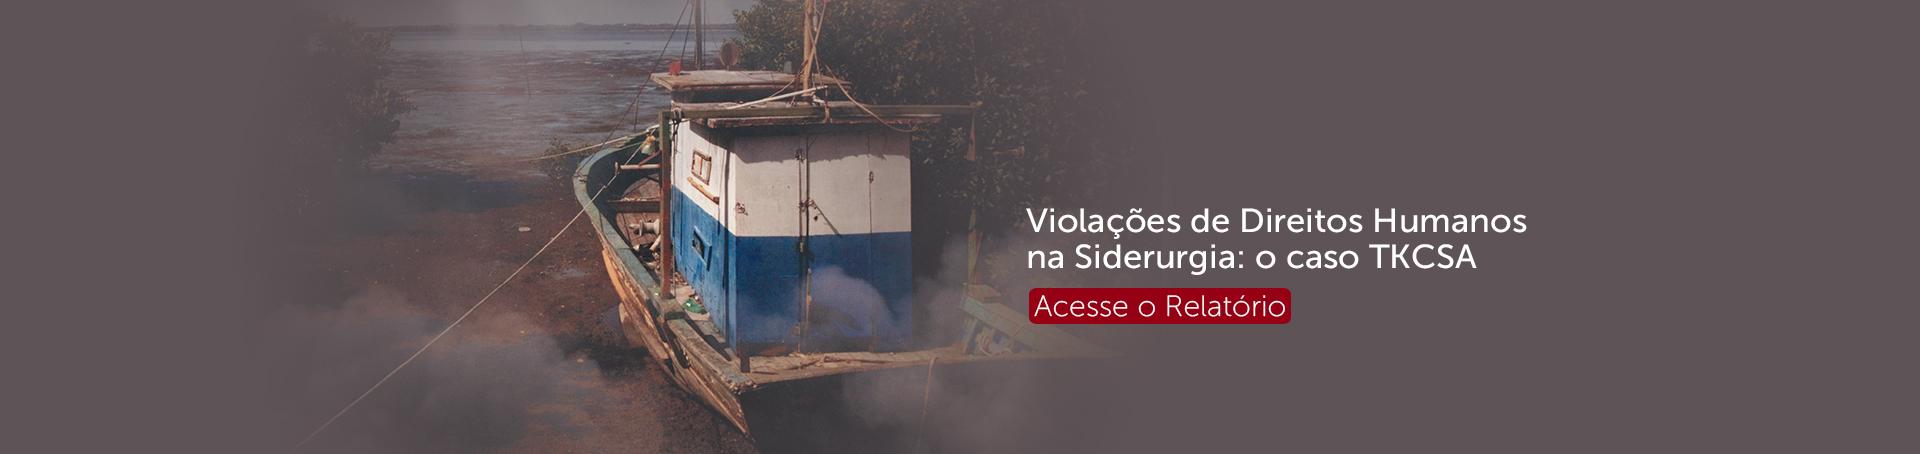 relatorio tkcsa capa site